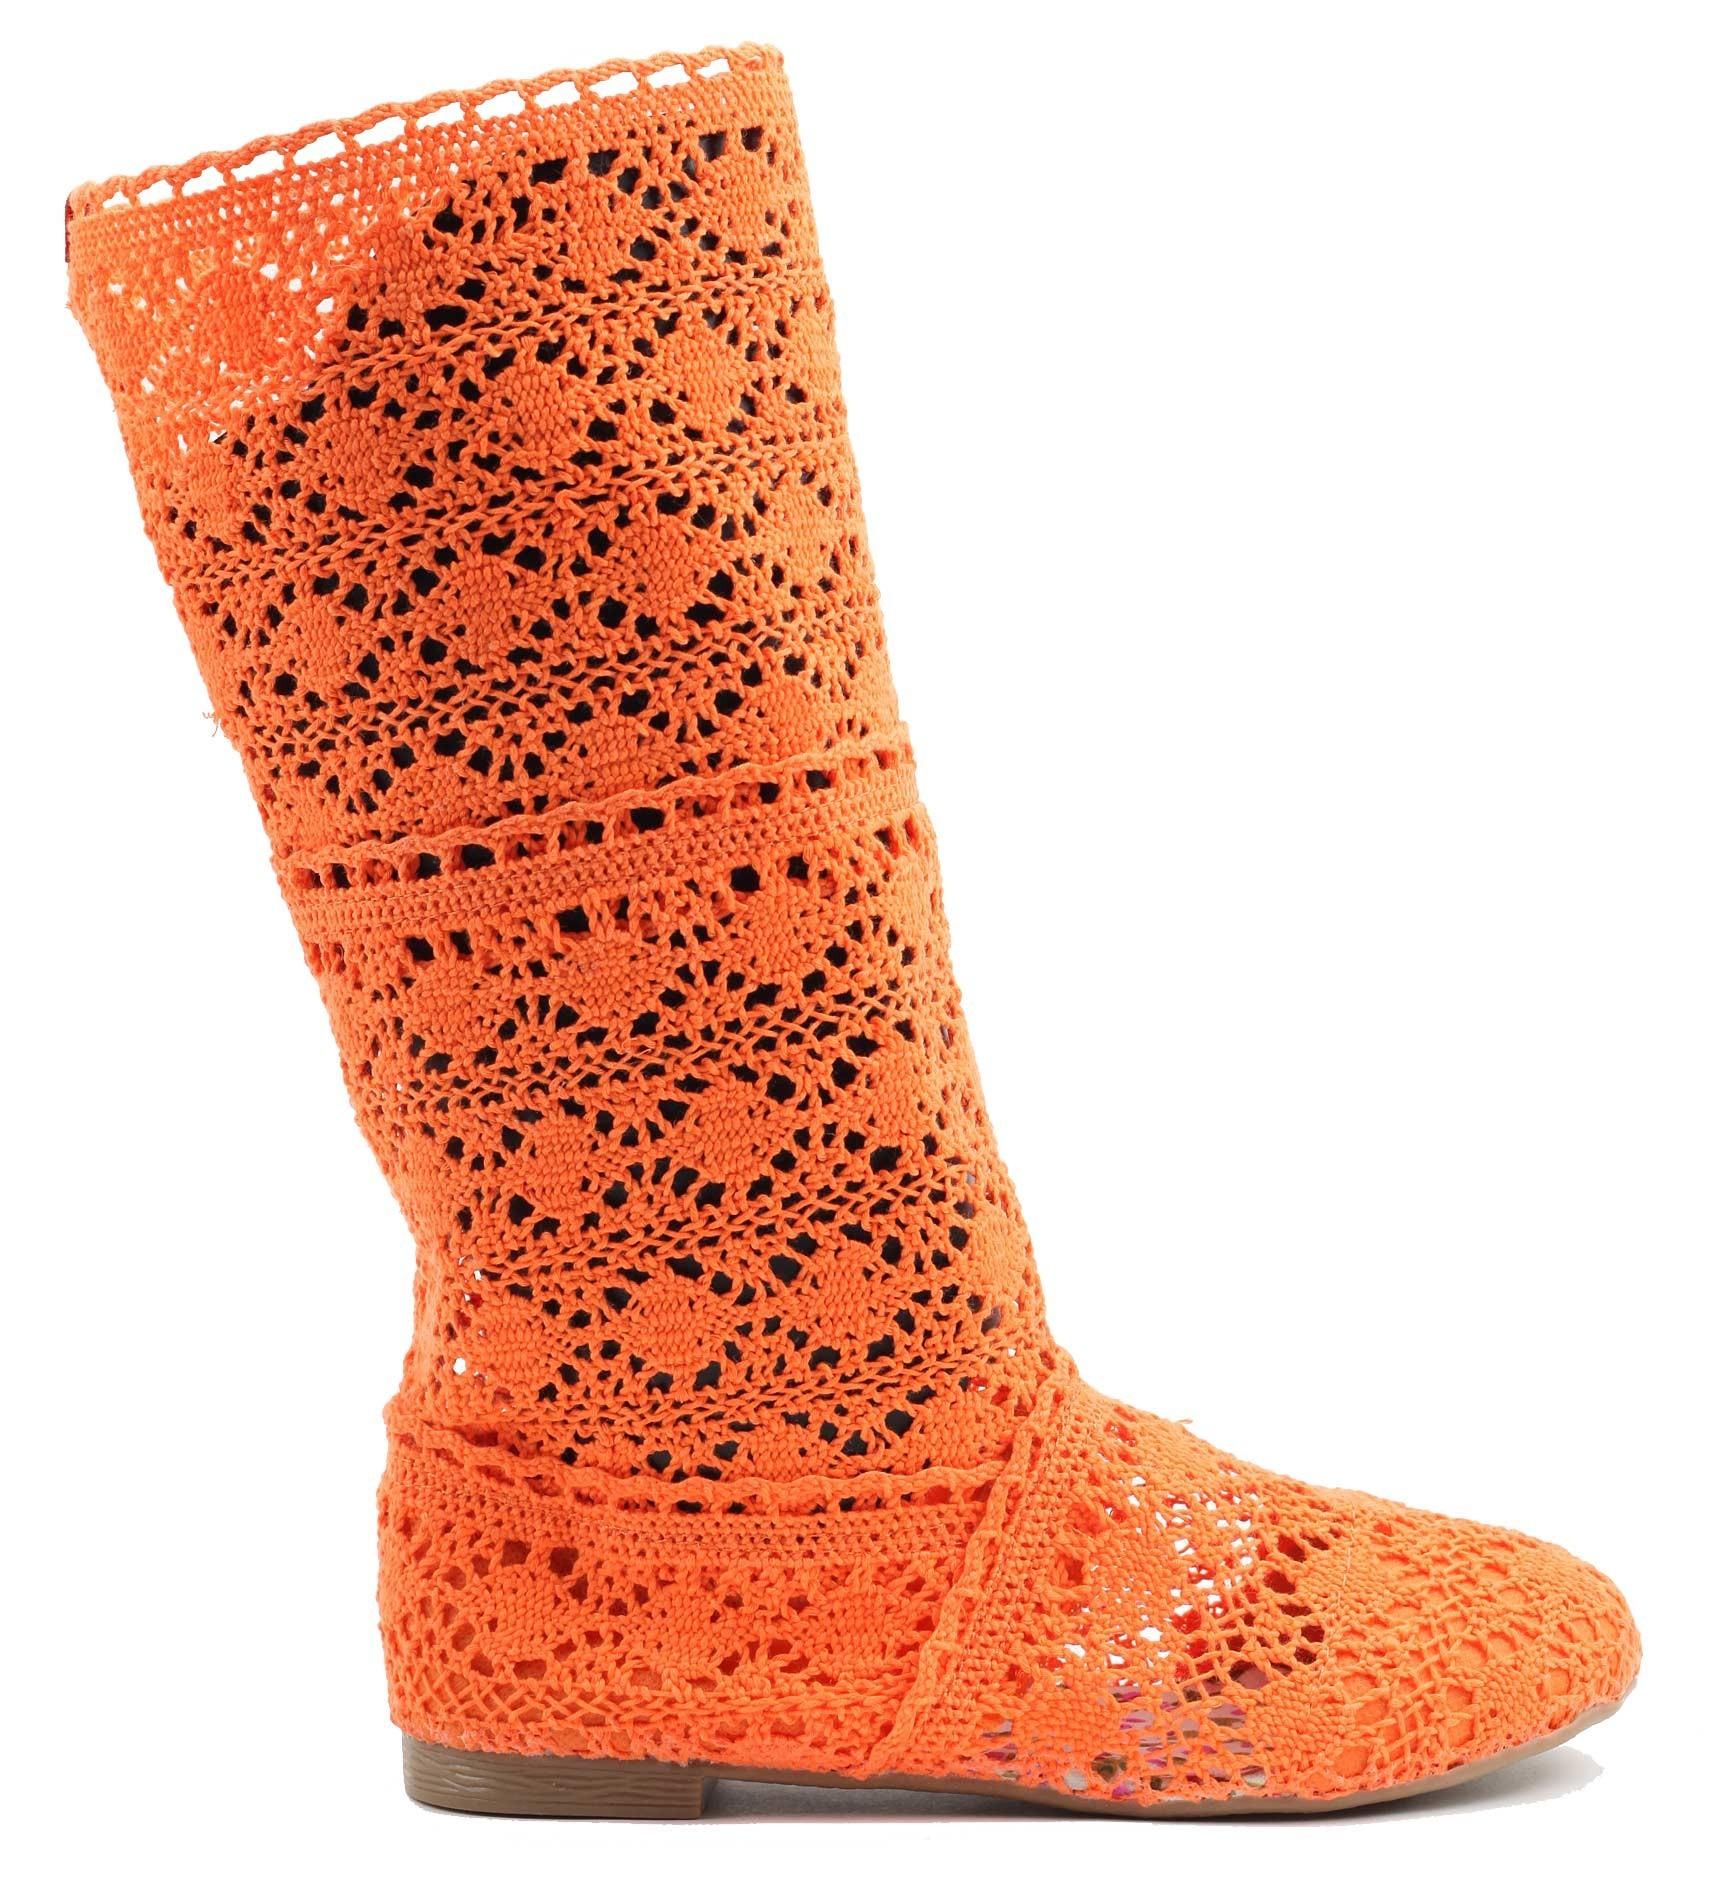 Danea e-shop a Internetový prodej obuvi. Dámská obuv b09d8cf9792